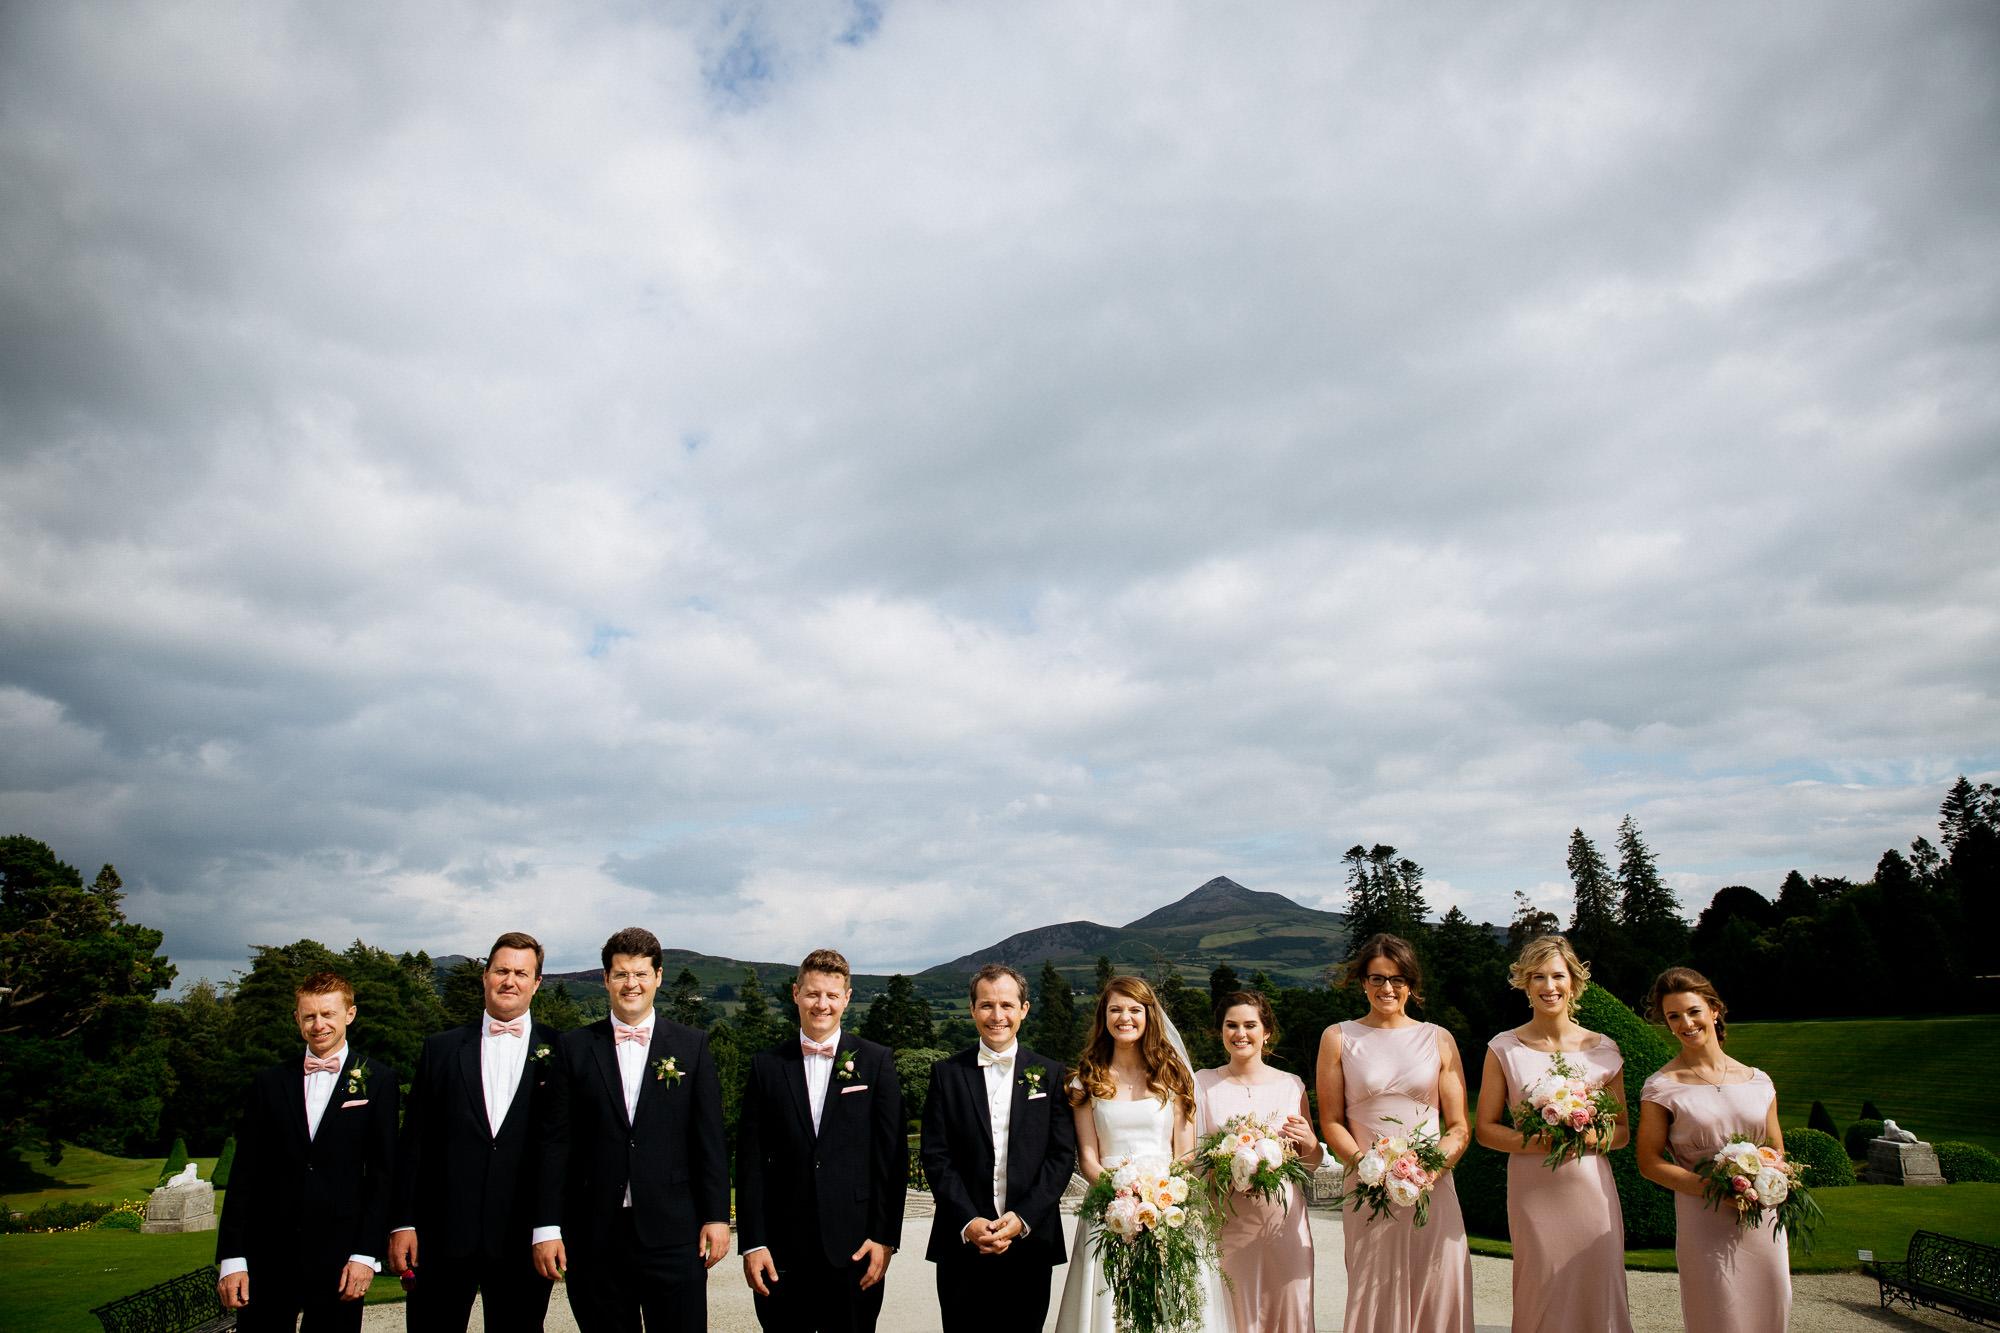 clairebyrnephotography-wedding-Emma-Max-16.jpg